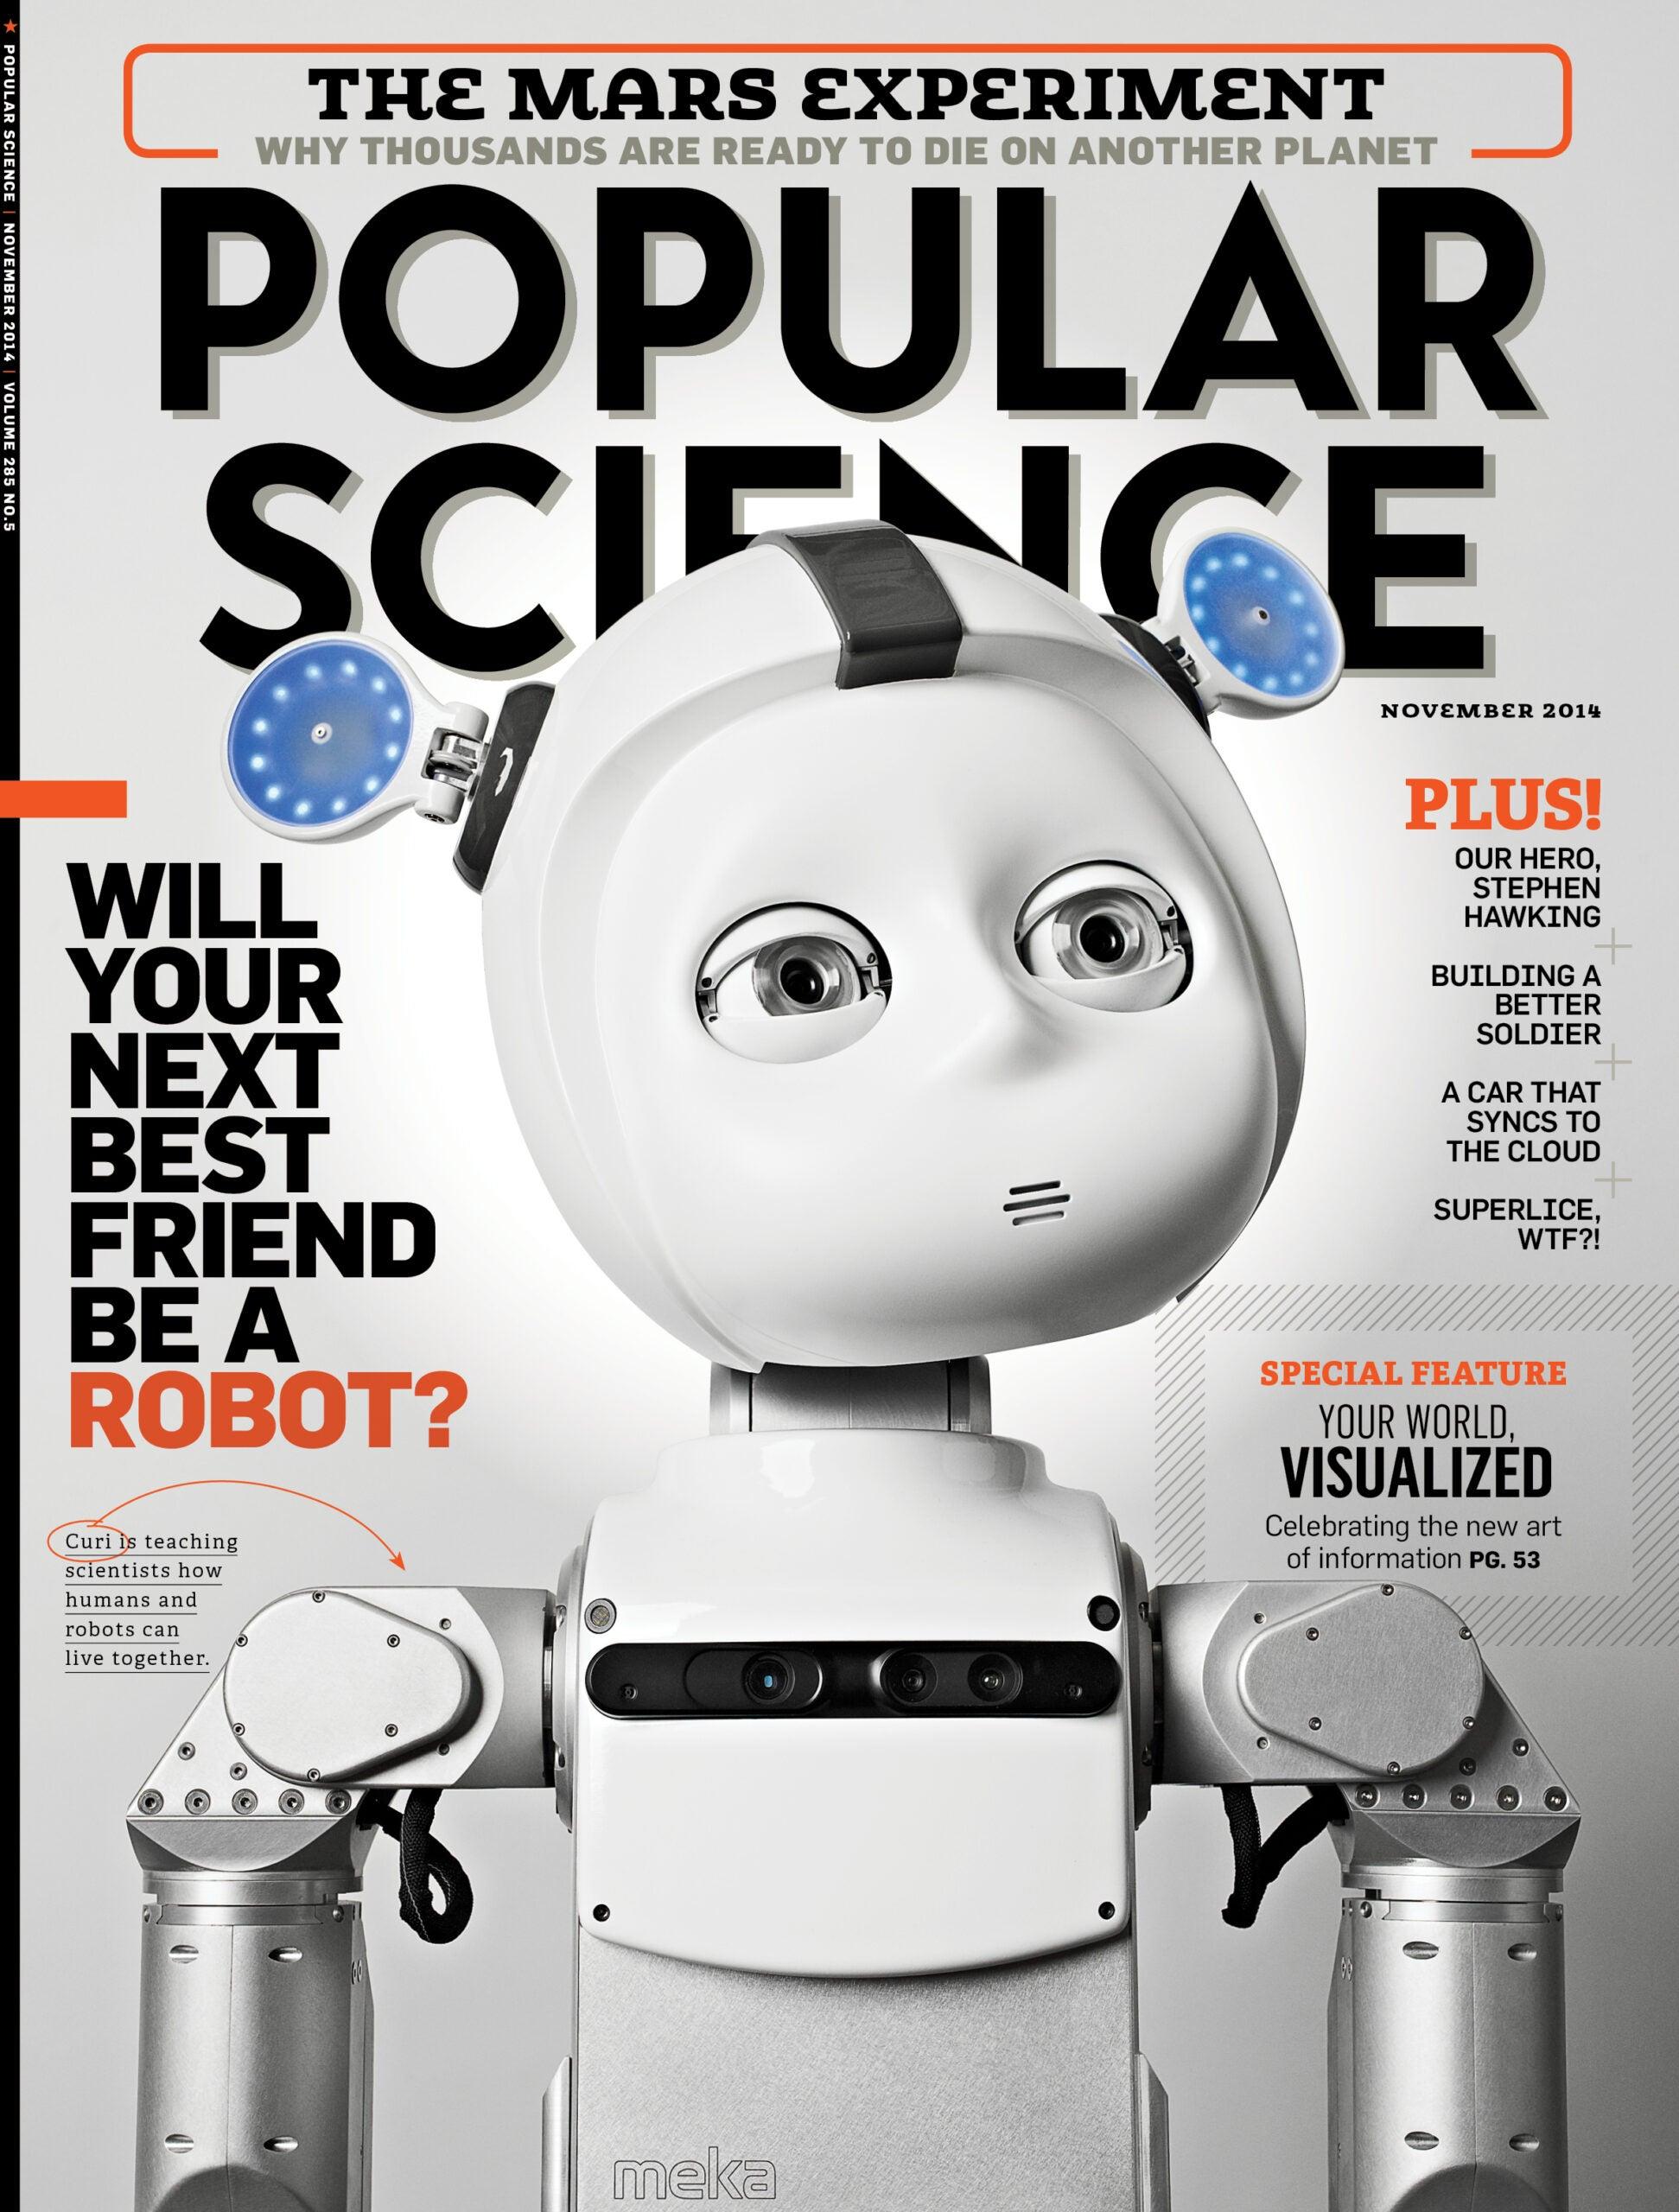 November 2014: Will Your Next Best Friend Be A Robot?